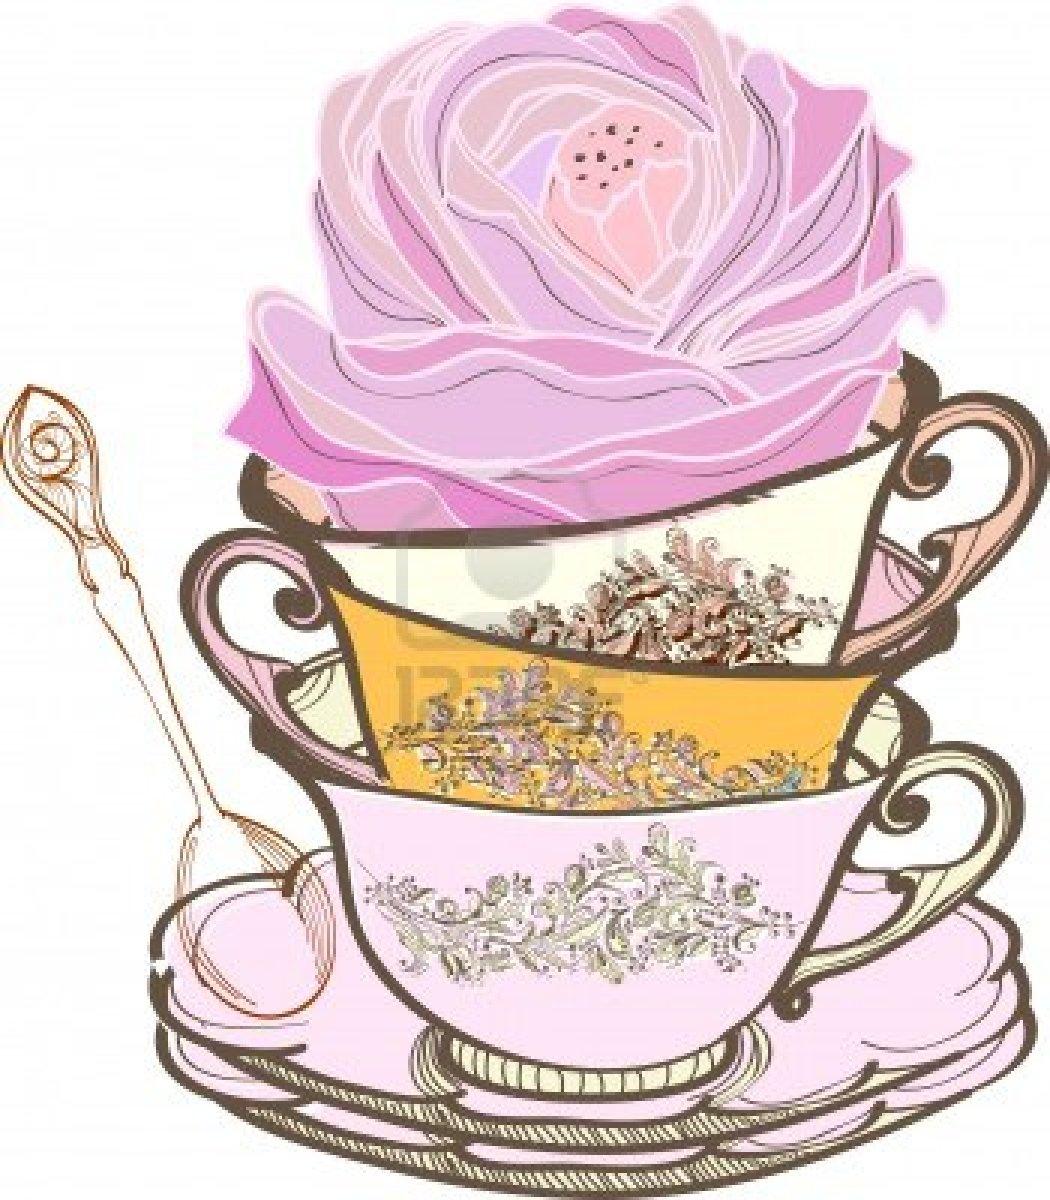 Teapot clipart teacup Pinterest Teacup Teacup For